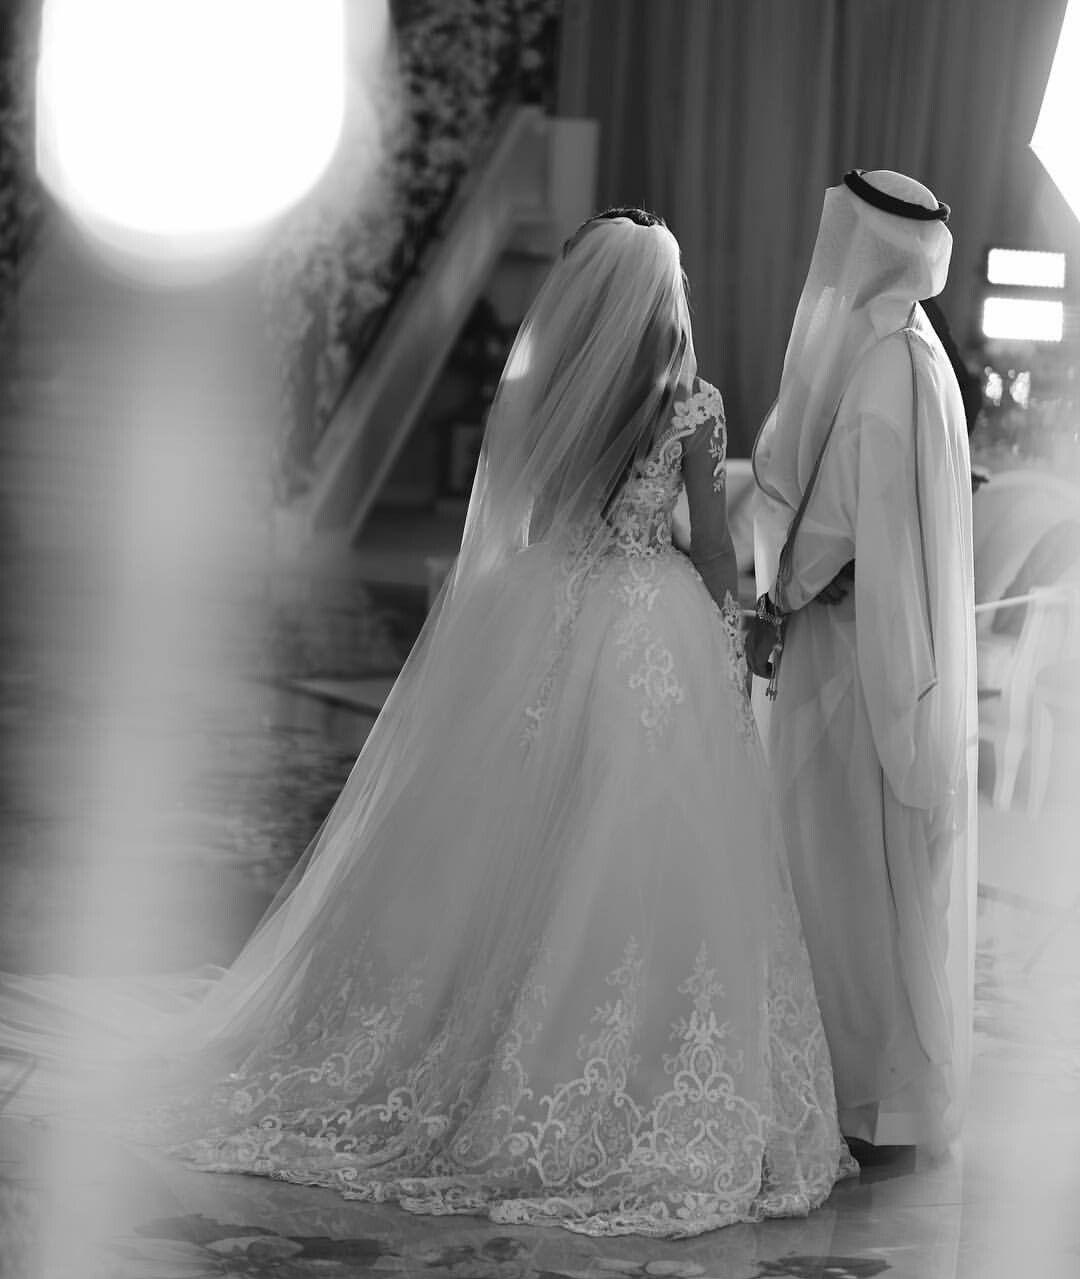 Saudi Wedding Arabwedding Arabcouple Saudiwedding Arabian Wedding Arab Wedding Sparkle Wedding Dress